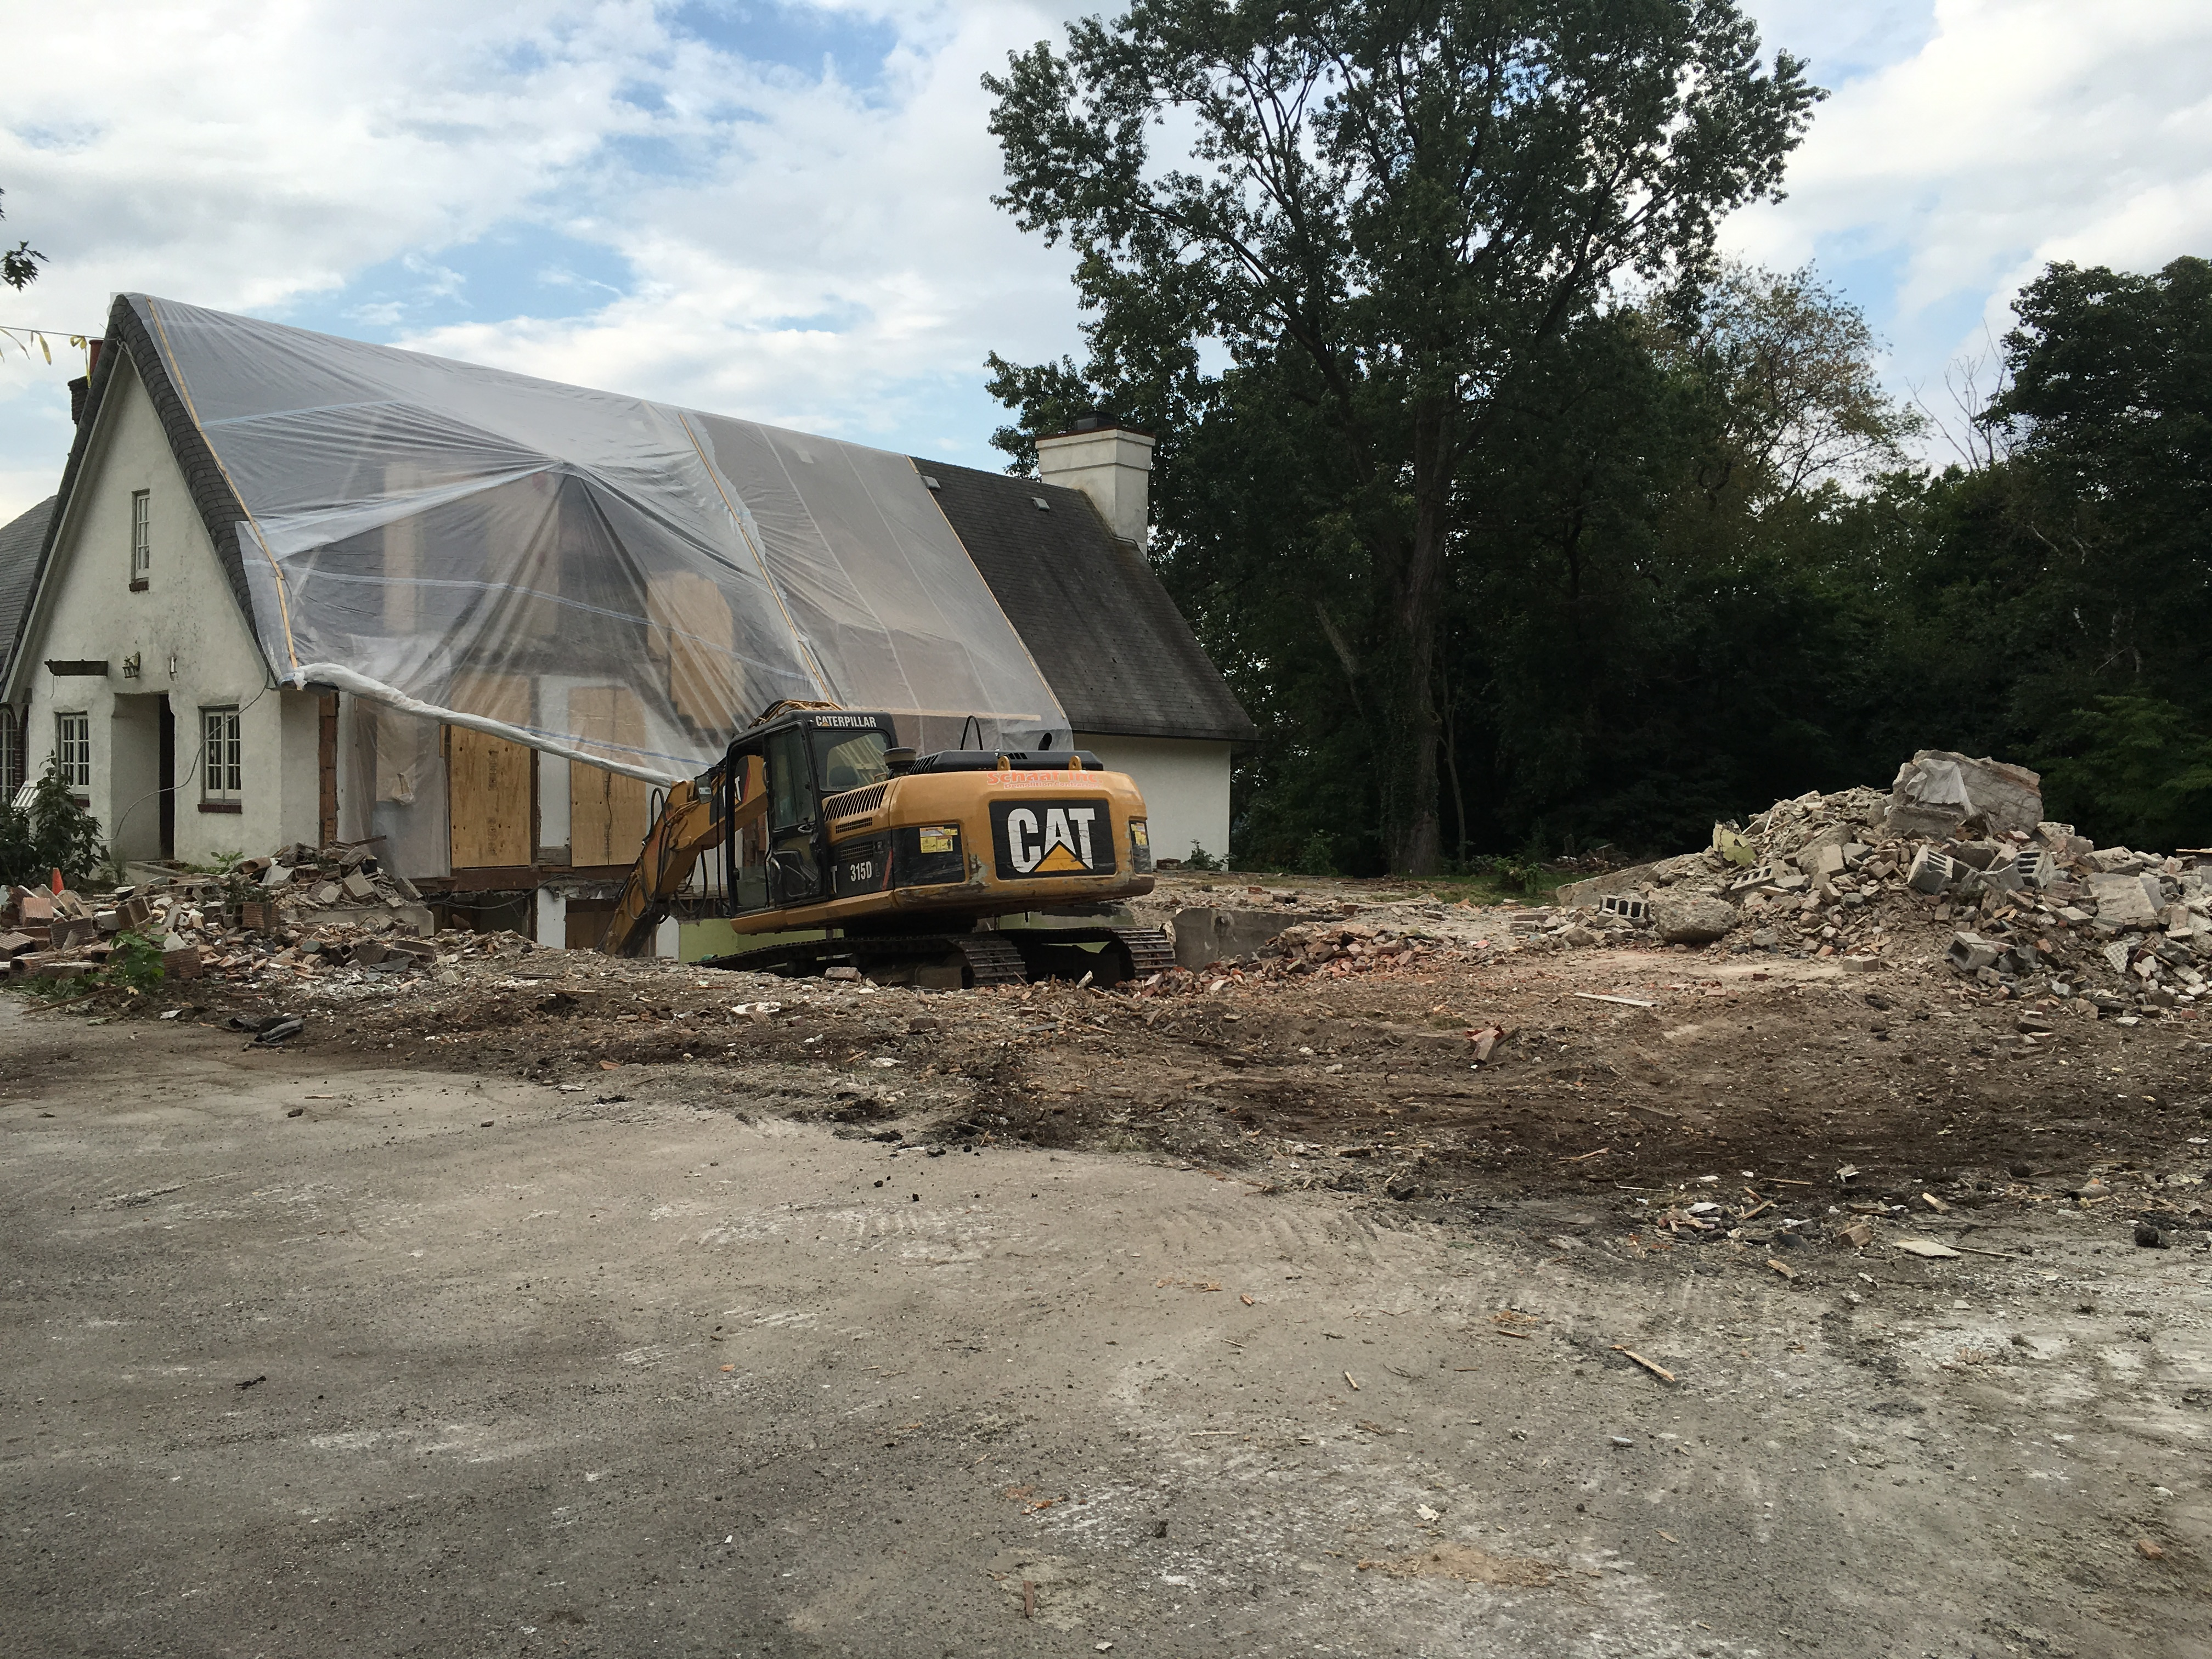 1609 Construction No North Wing